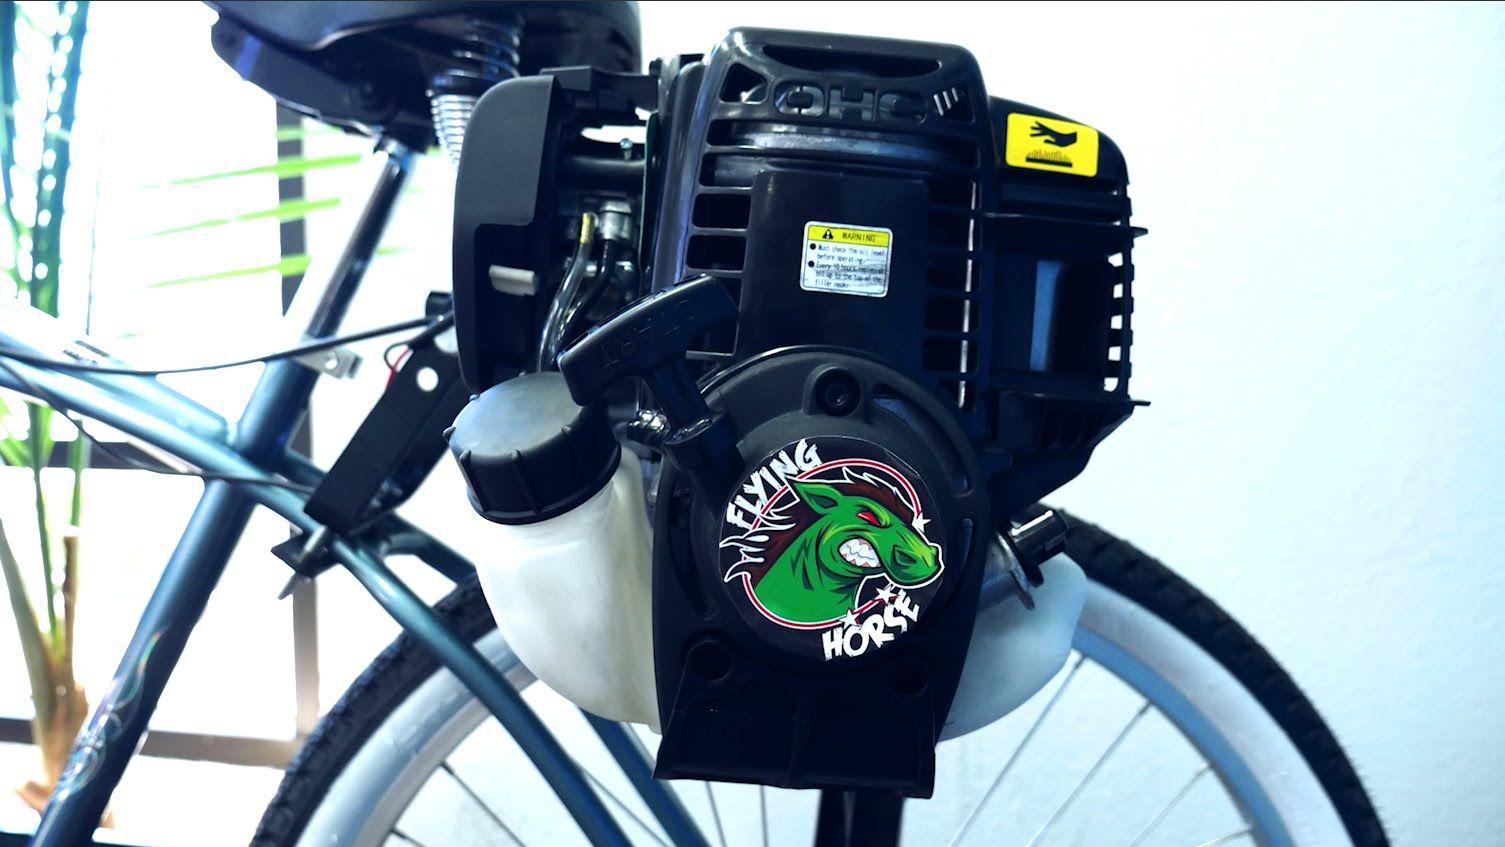 4 Stroke 38cc Friction Drive Motor Bicycle Engine Kit Installation